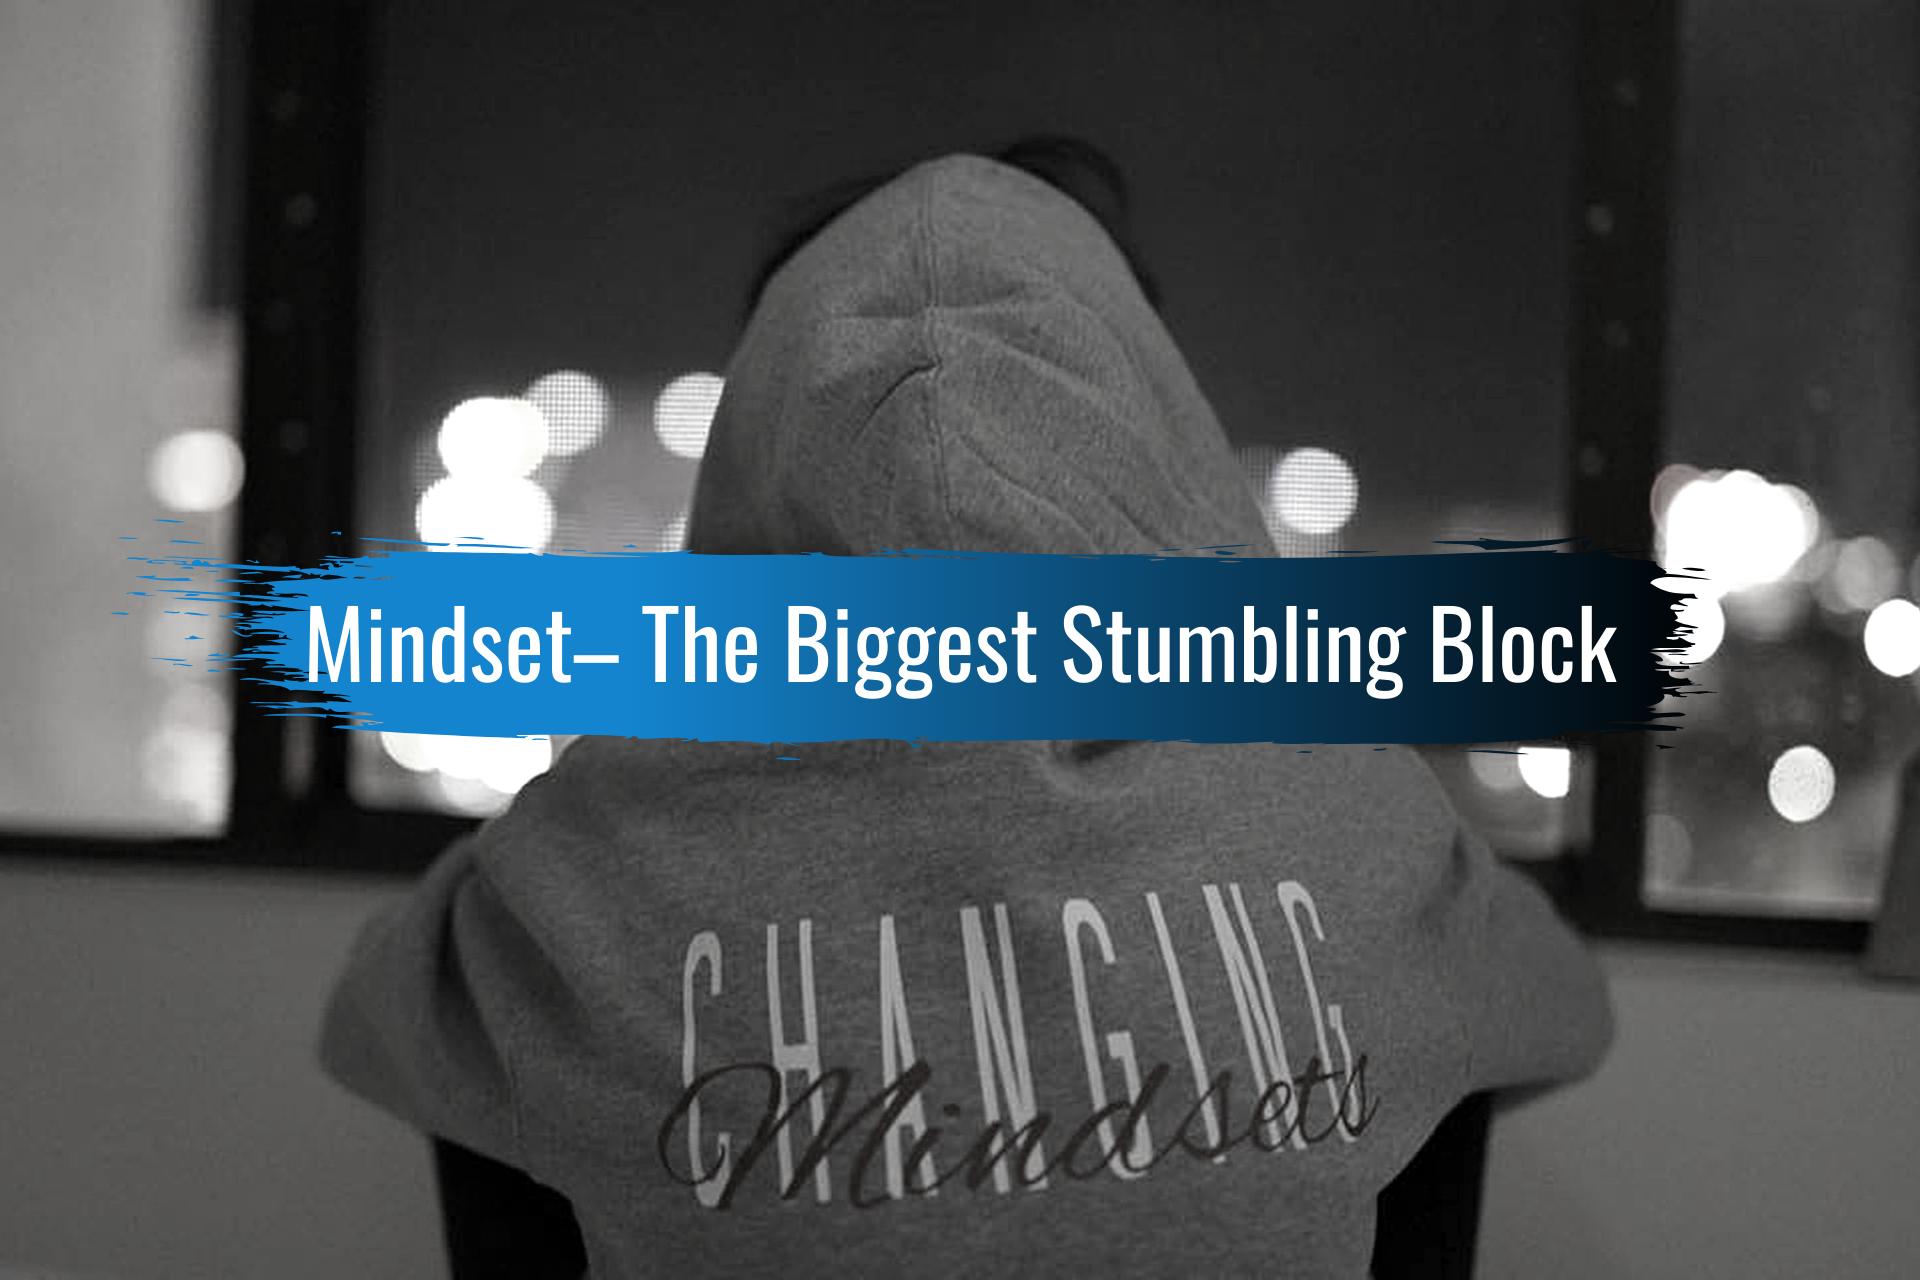 Mindset is the biggest stumbling block